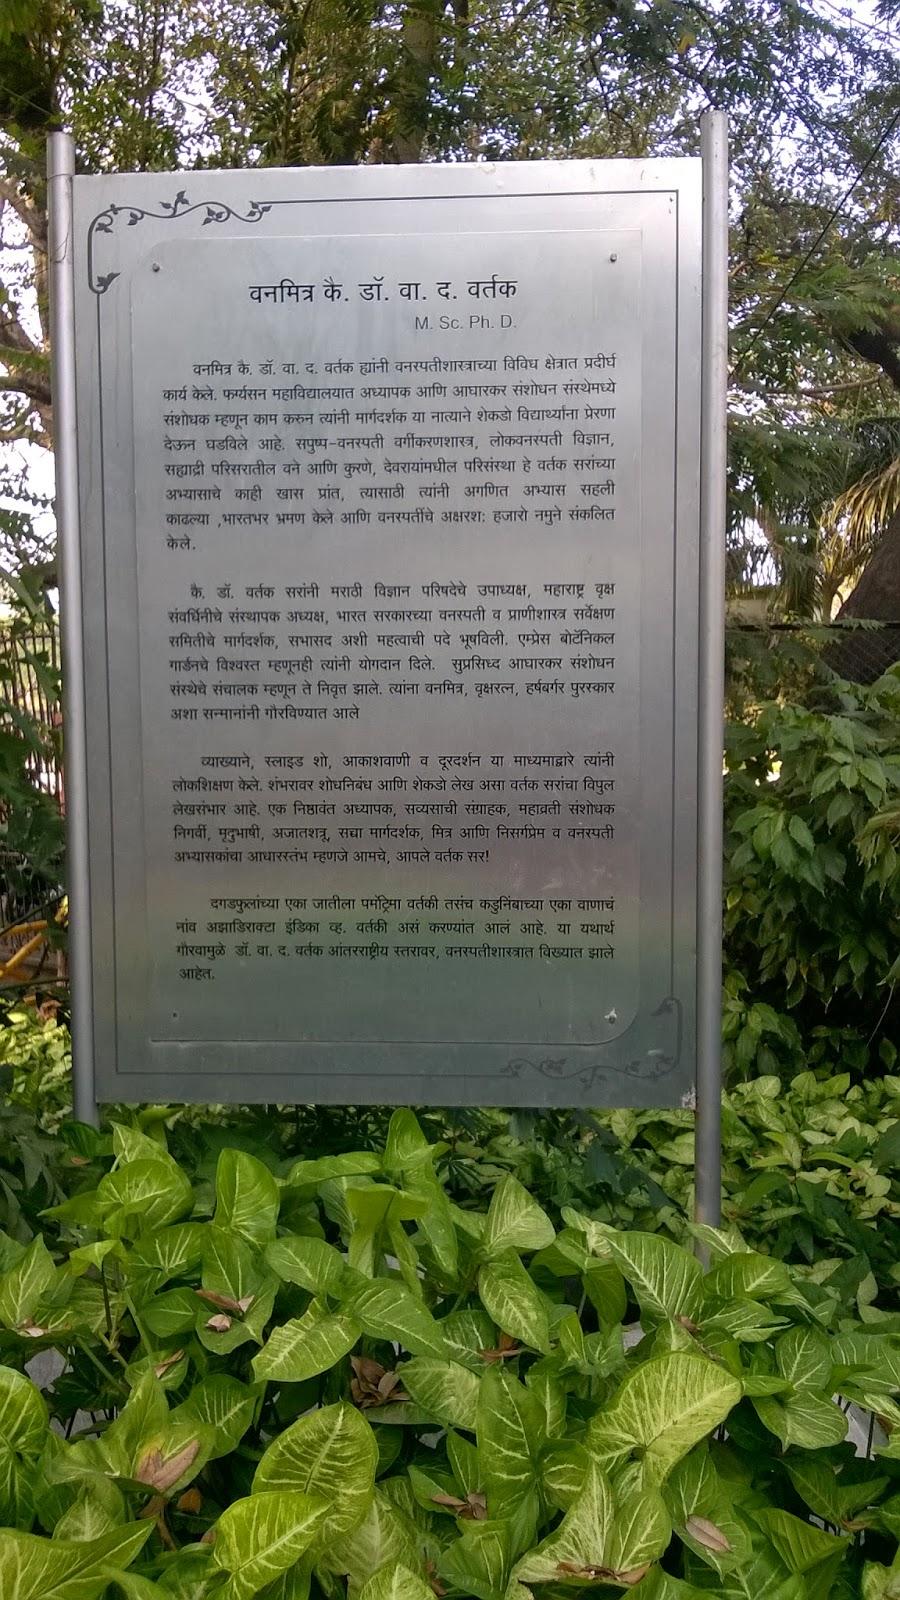 Pune, botanists, garden